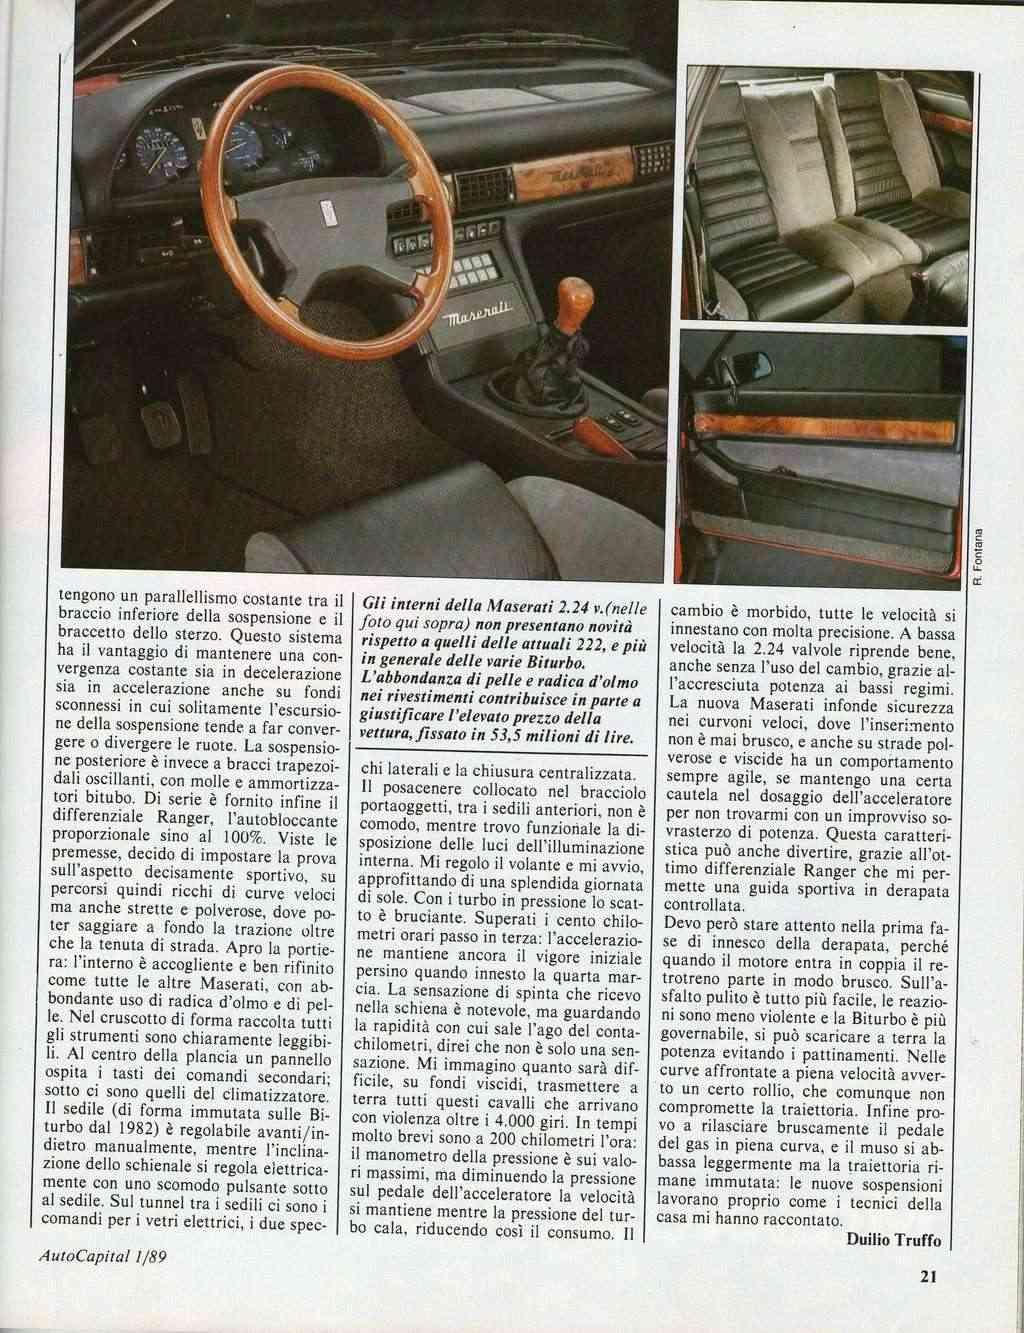 long term test Maserati 2.24v.....autocapital novembre 1989 Immagi29